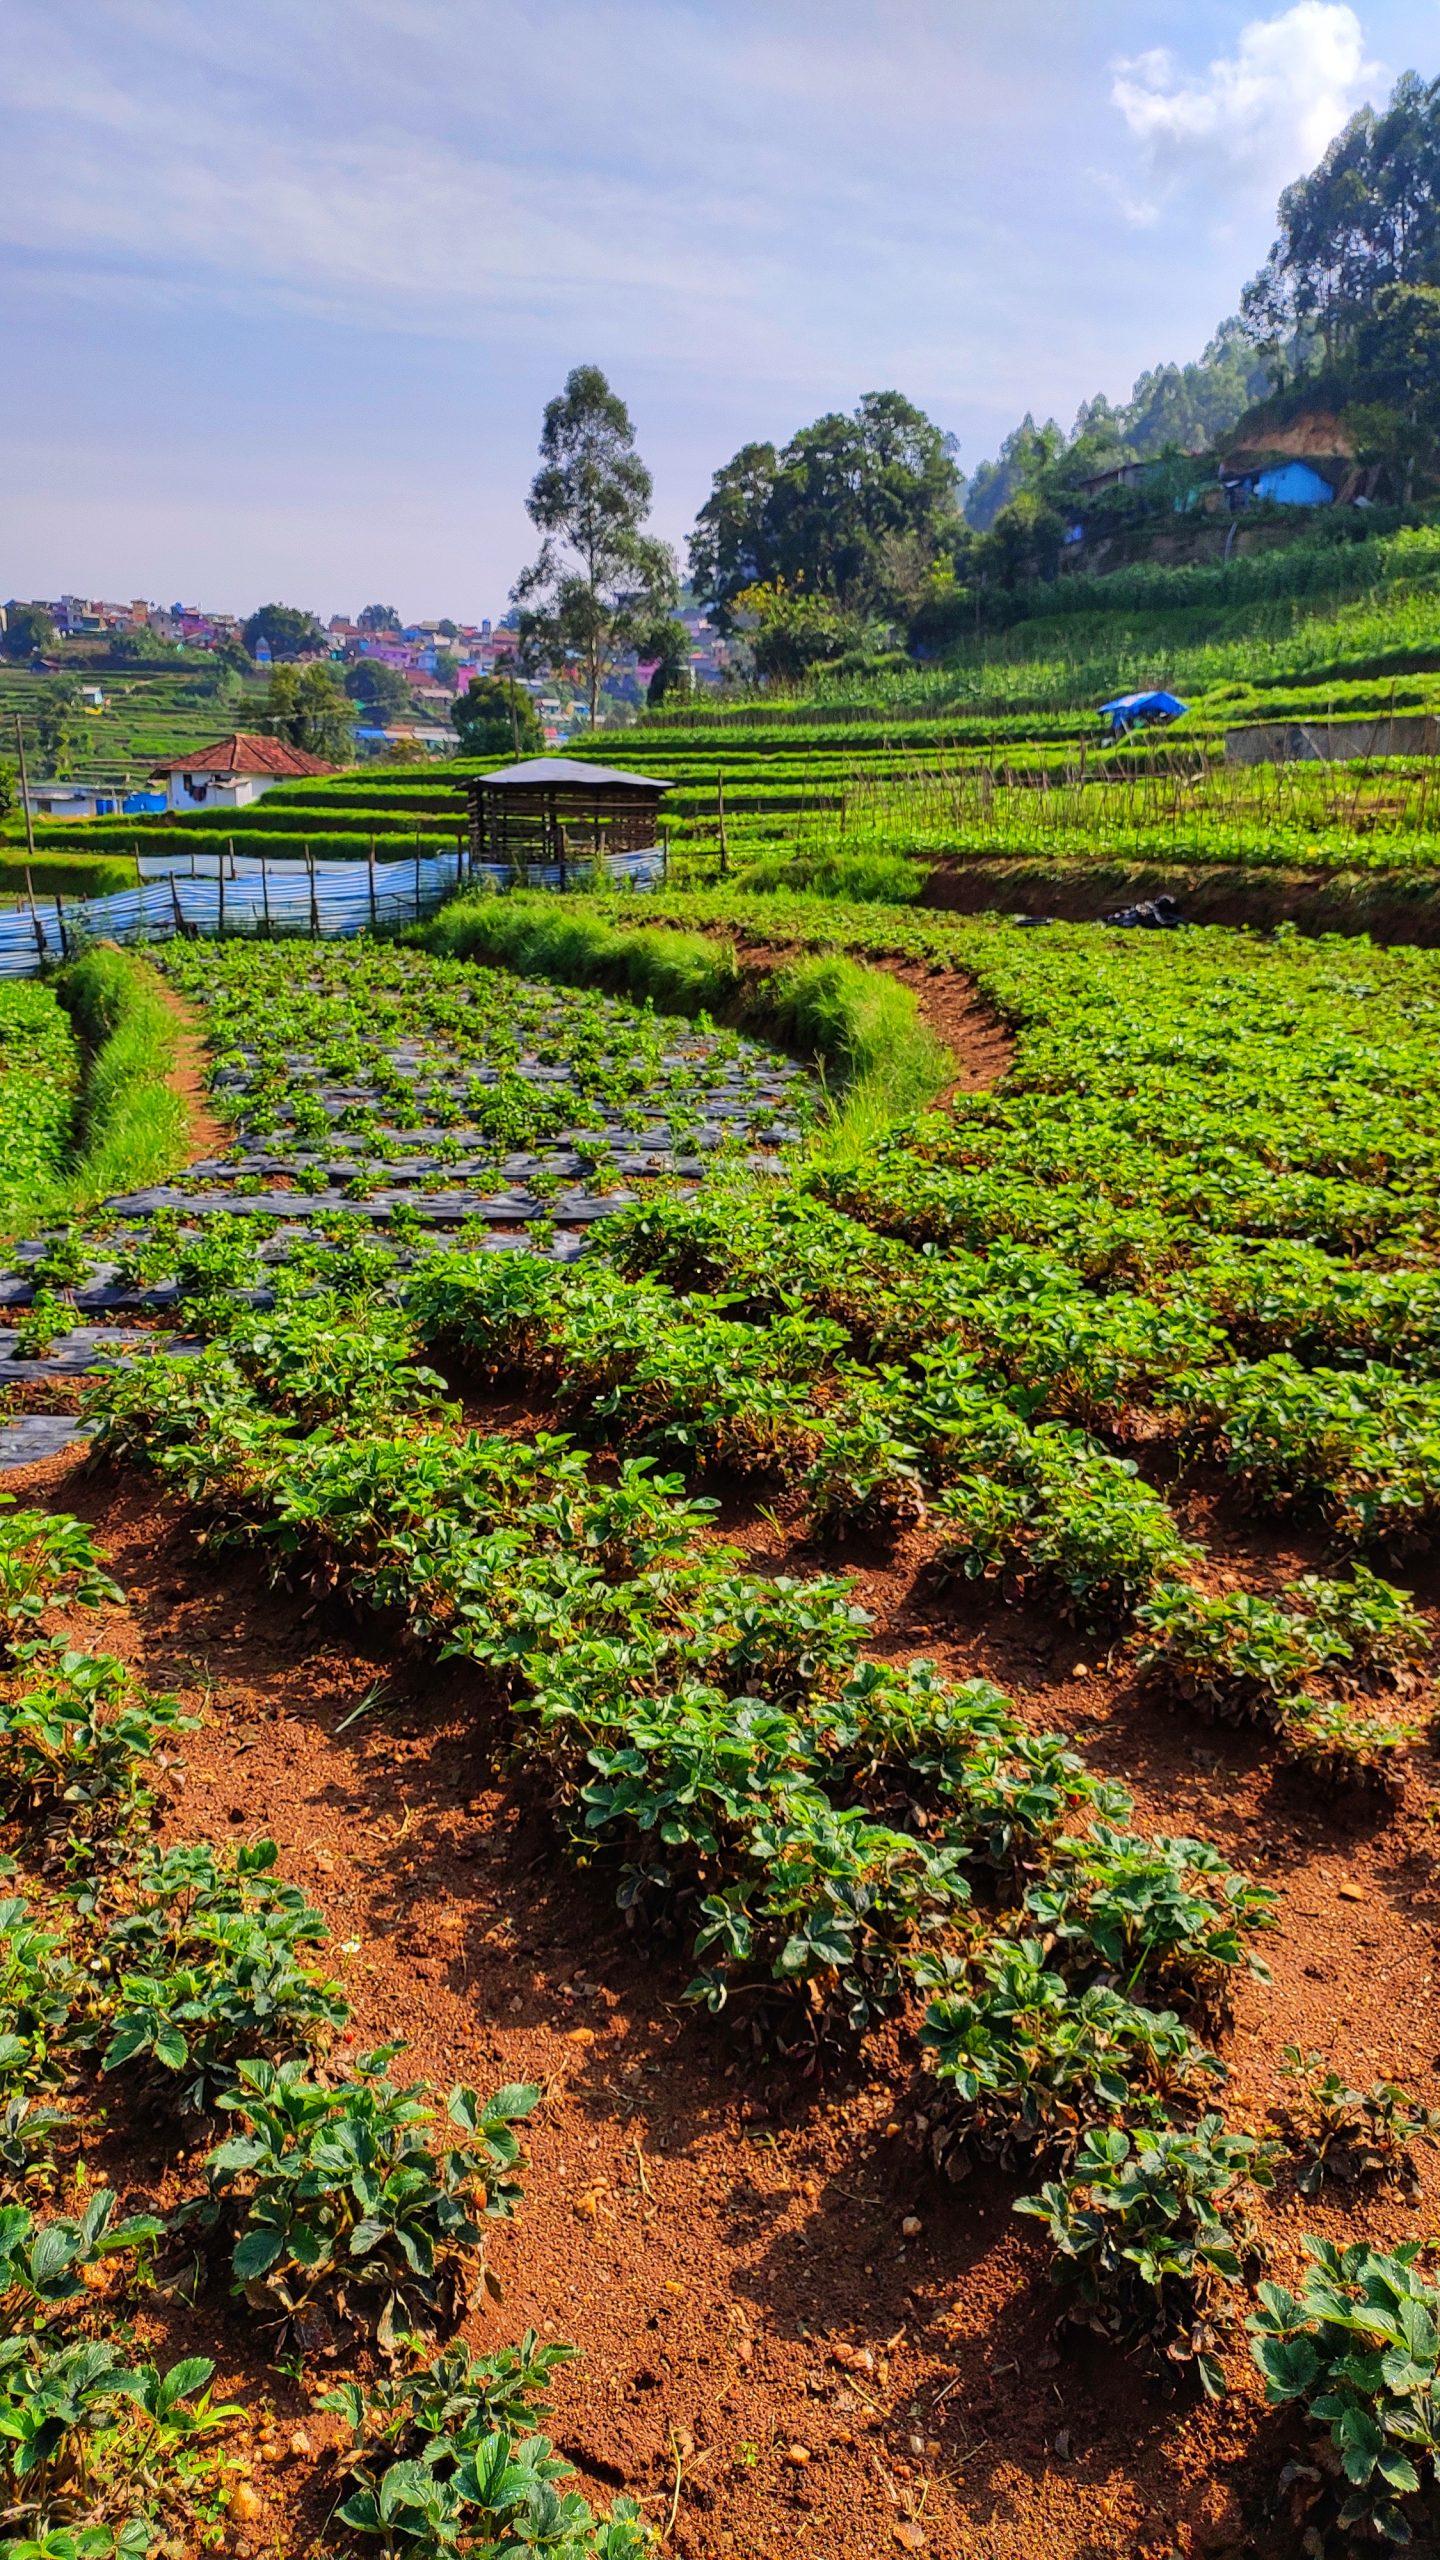 Strawberry plantation garden